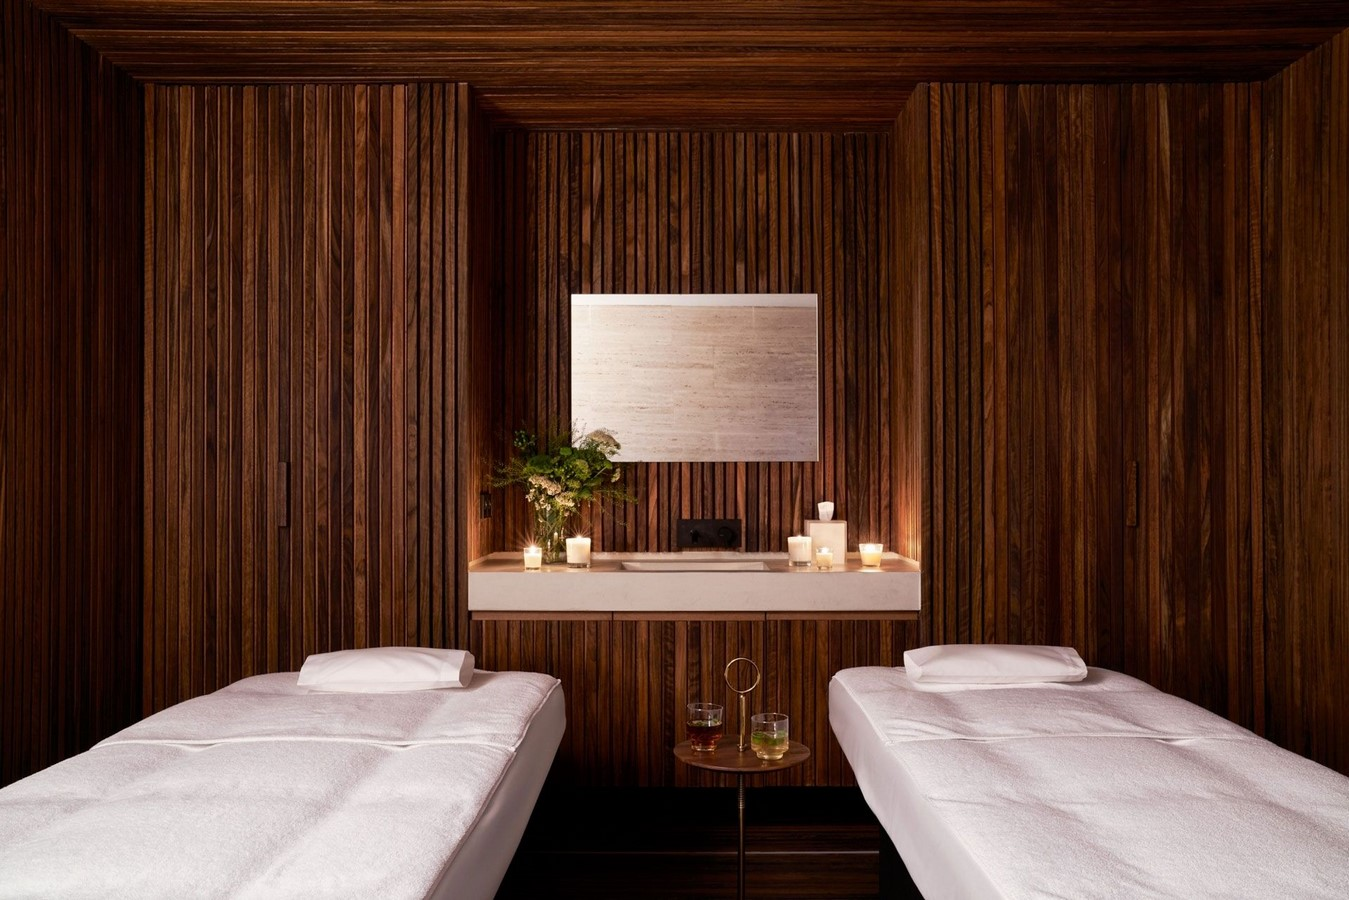 Mytha Spa - Hotel Villa Magna - Sheet1